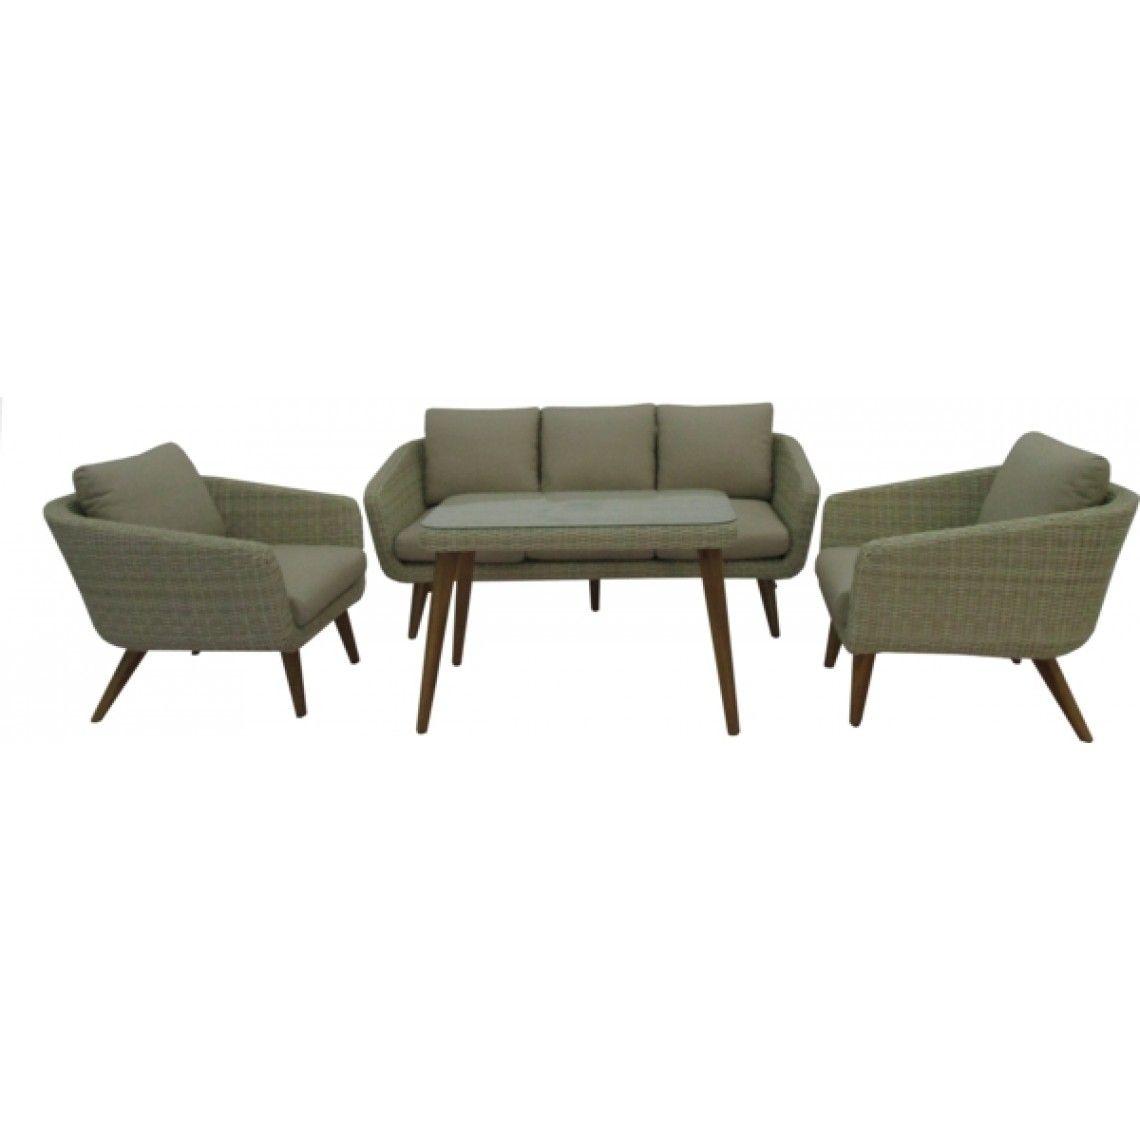 Inredning teak utemöbler : Sofagruppe Sabina 2+1+1 | Utemøbler | Pinterest | Teak